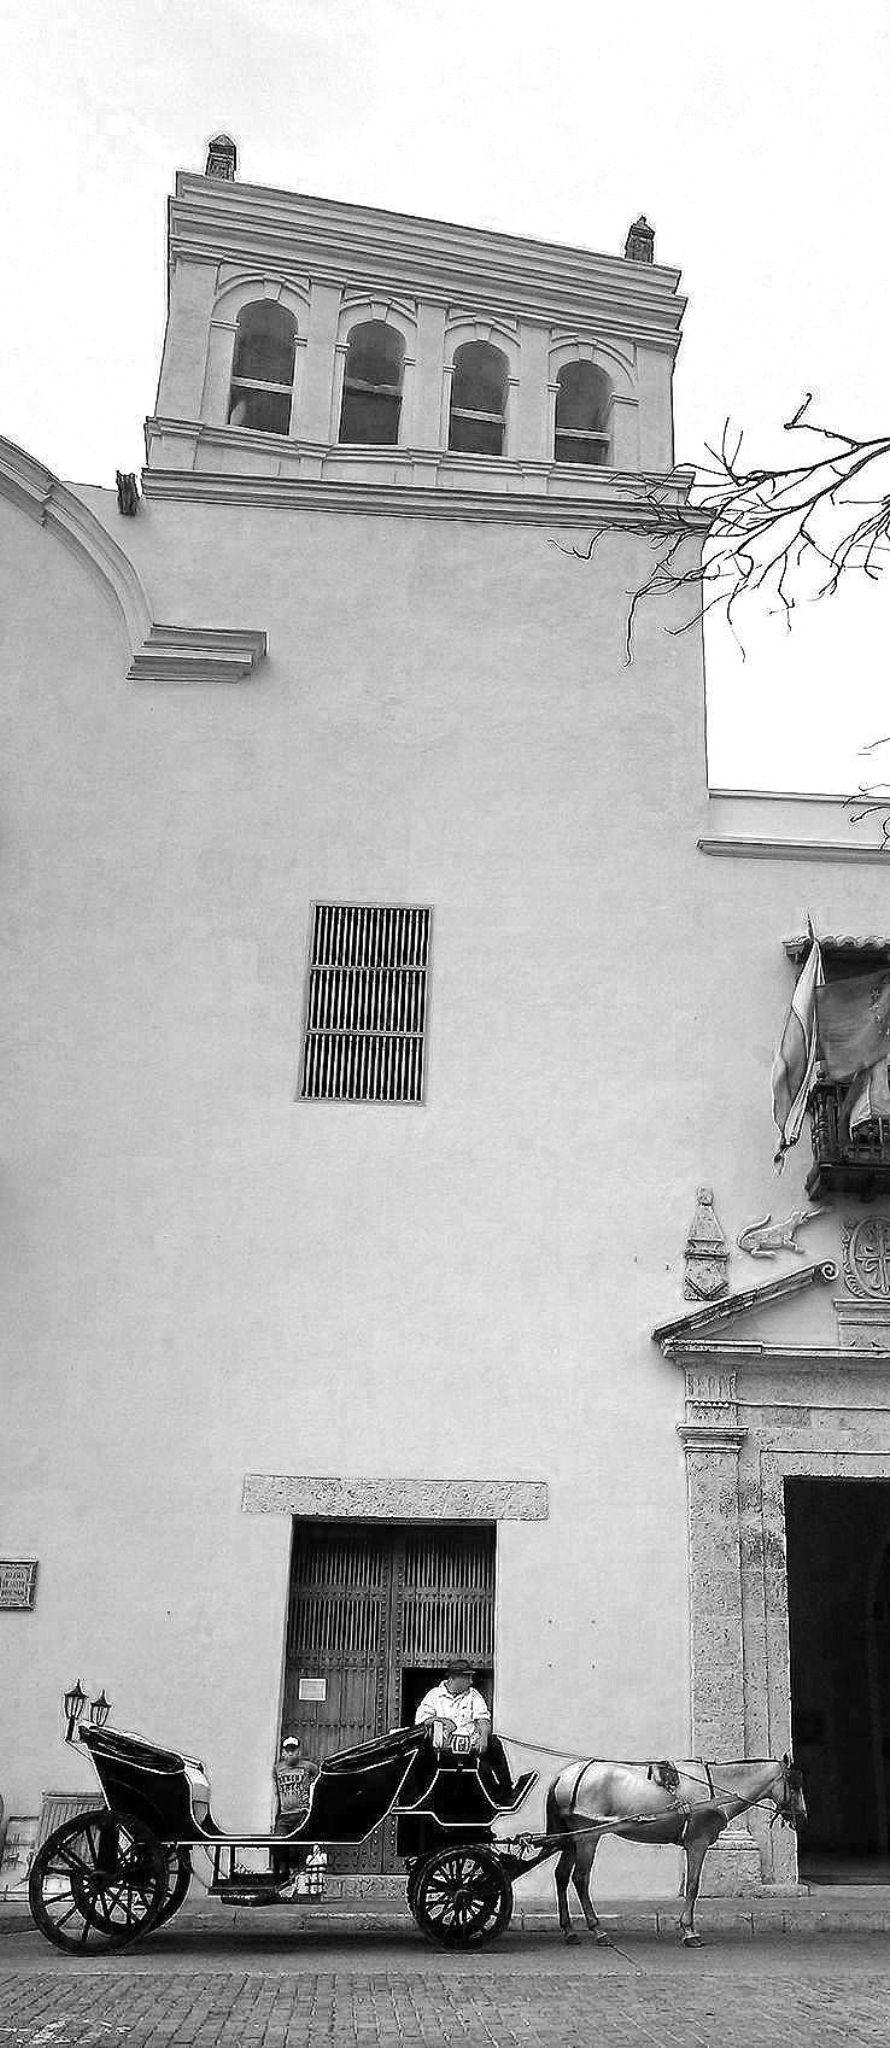 Twisted tower by Edgar Serna